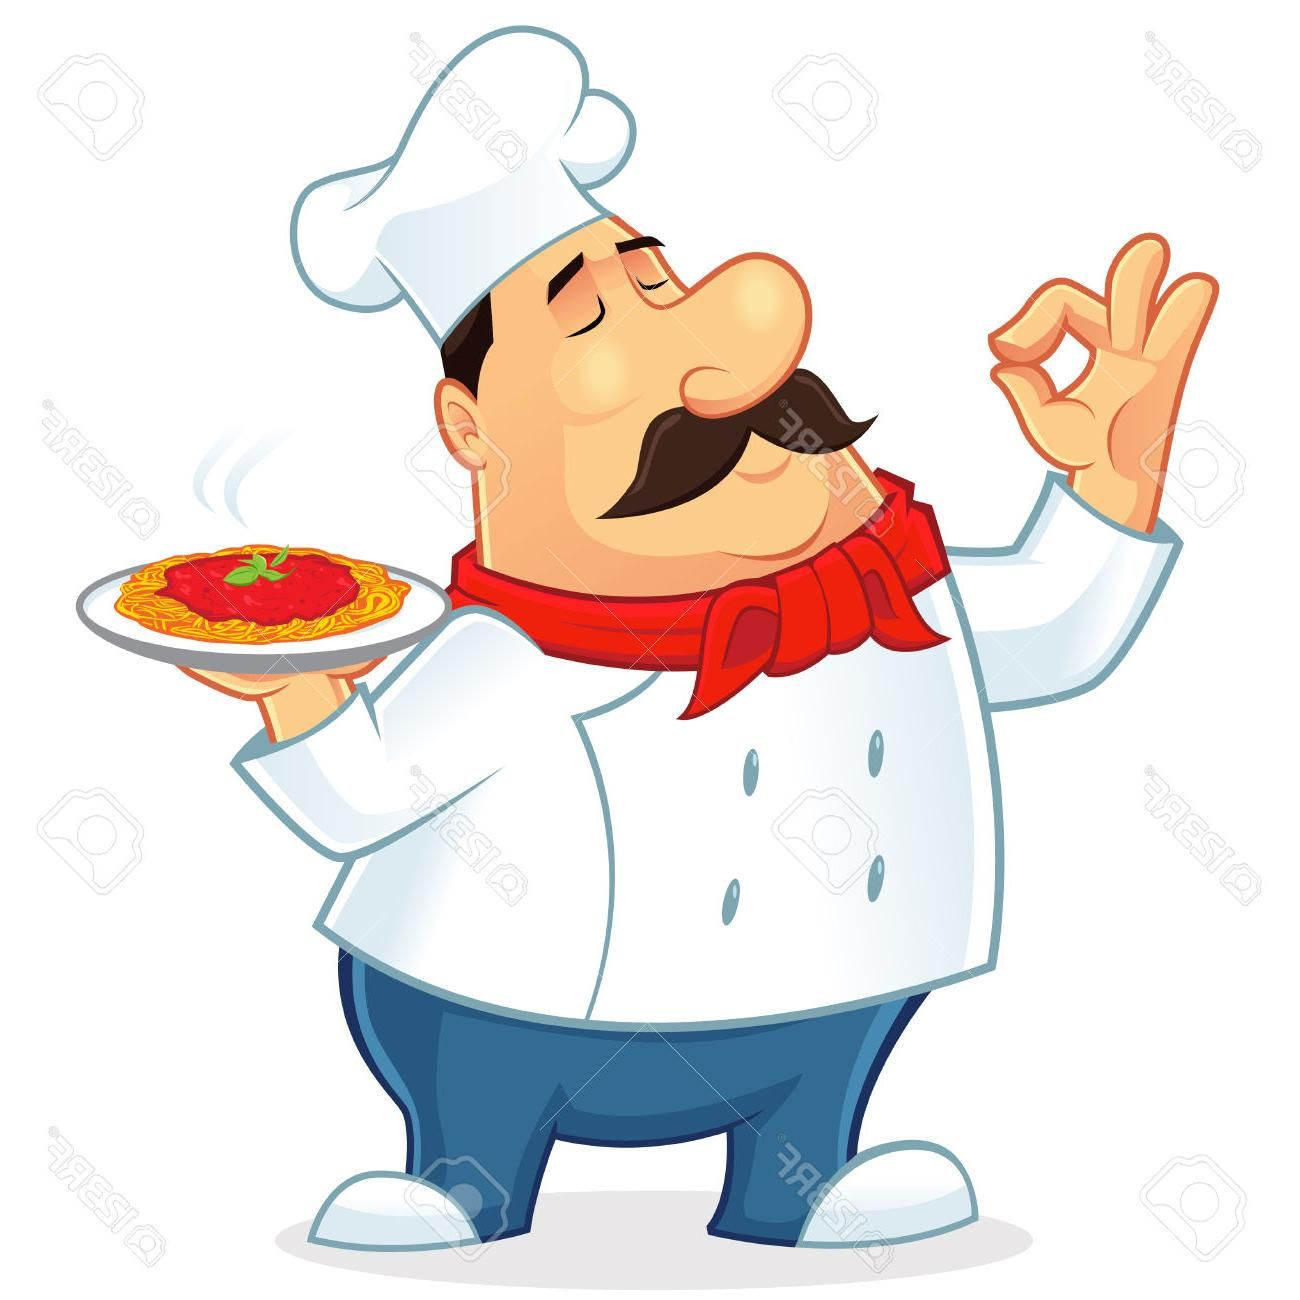 Cooking clipart chef italian. Free clipartxtras treasures